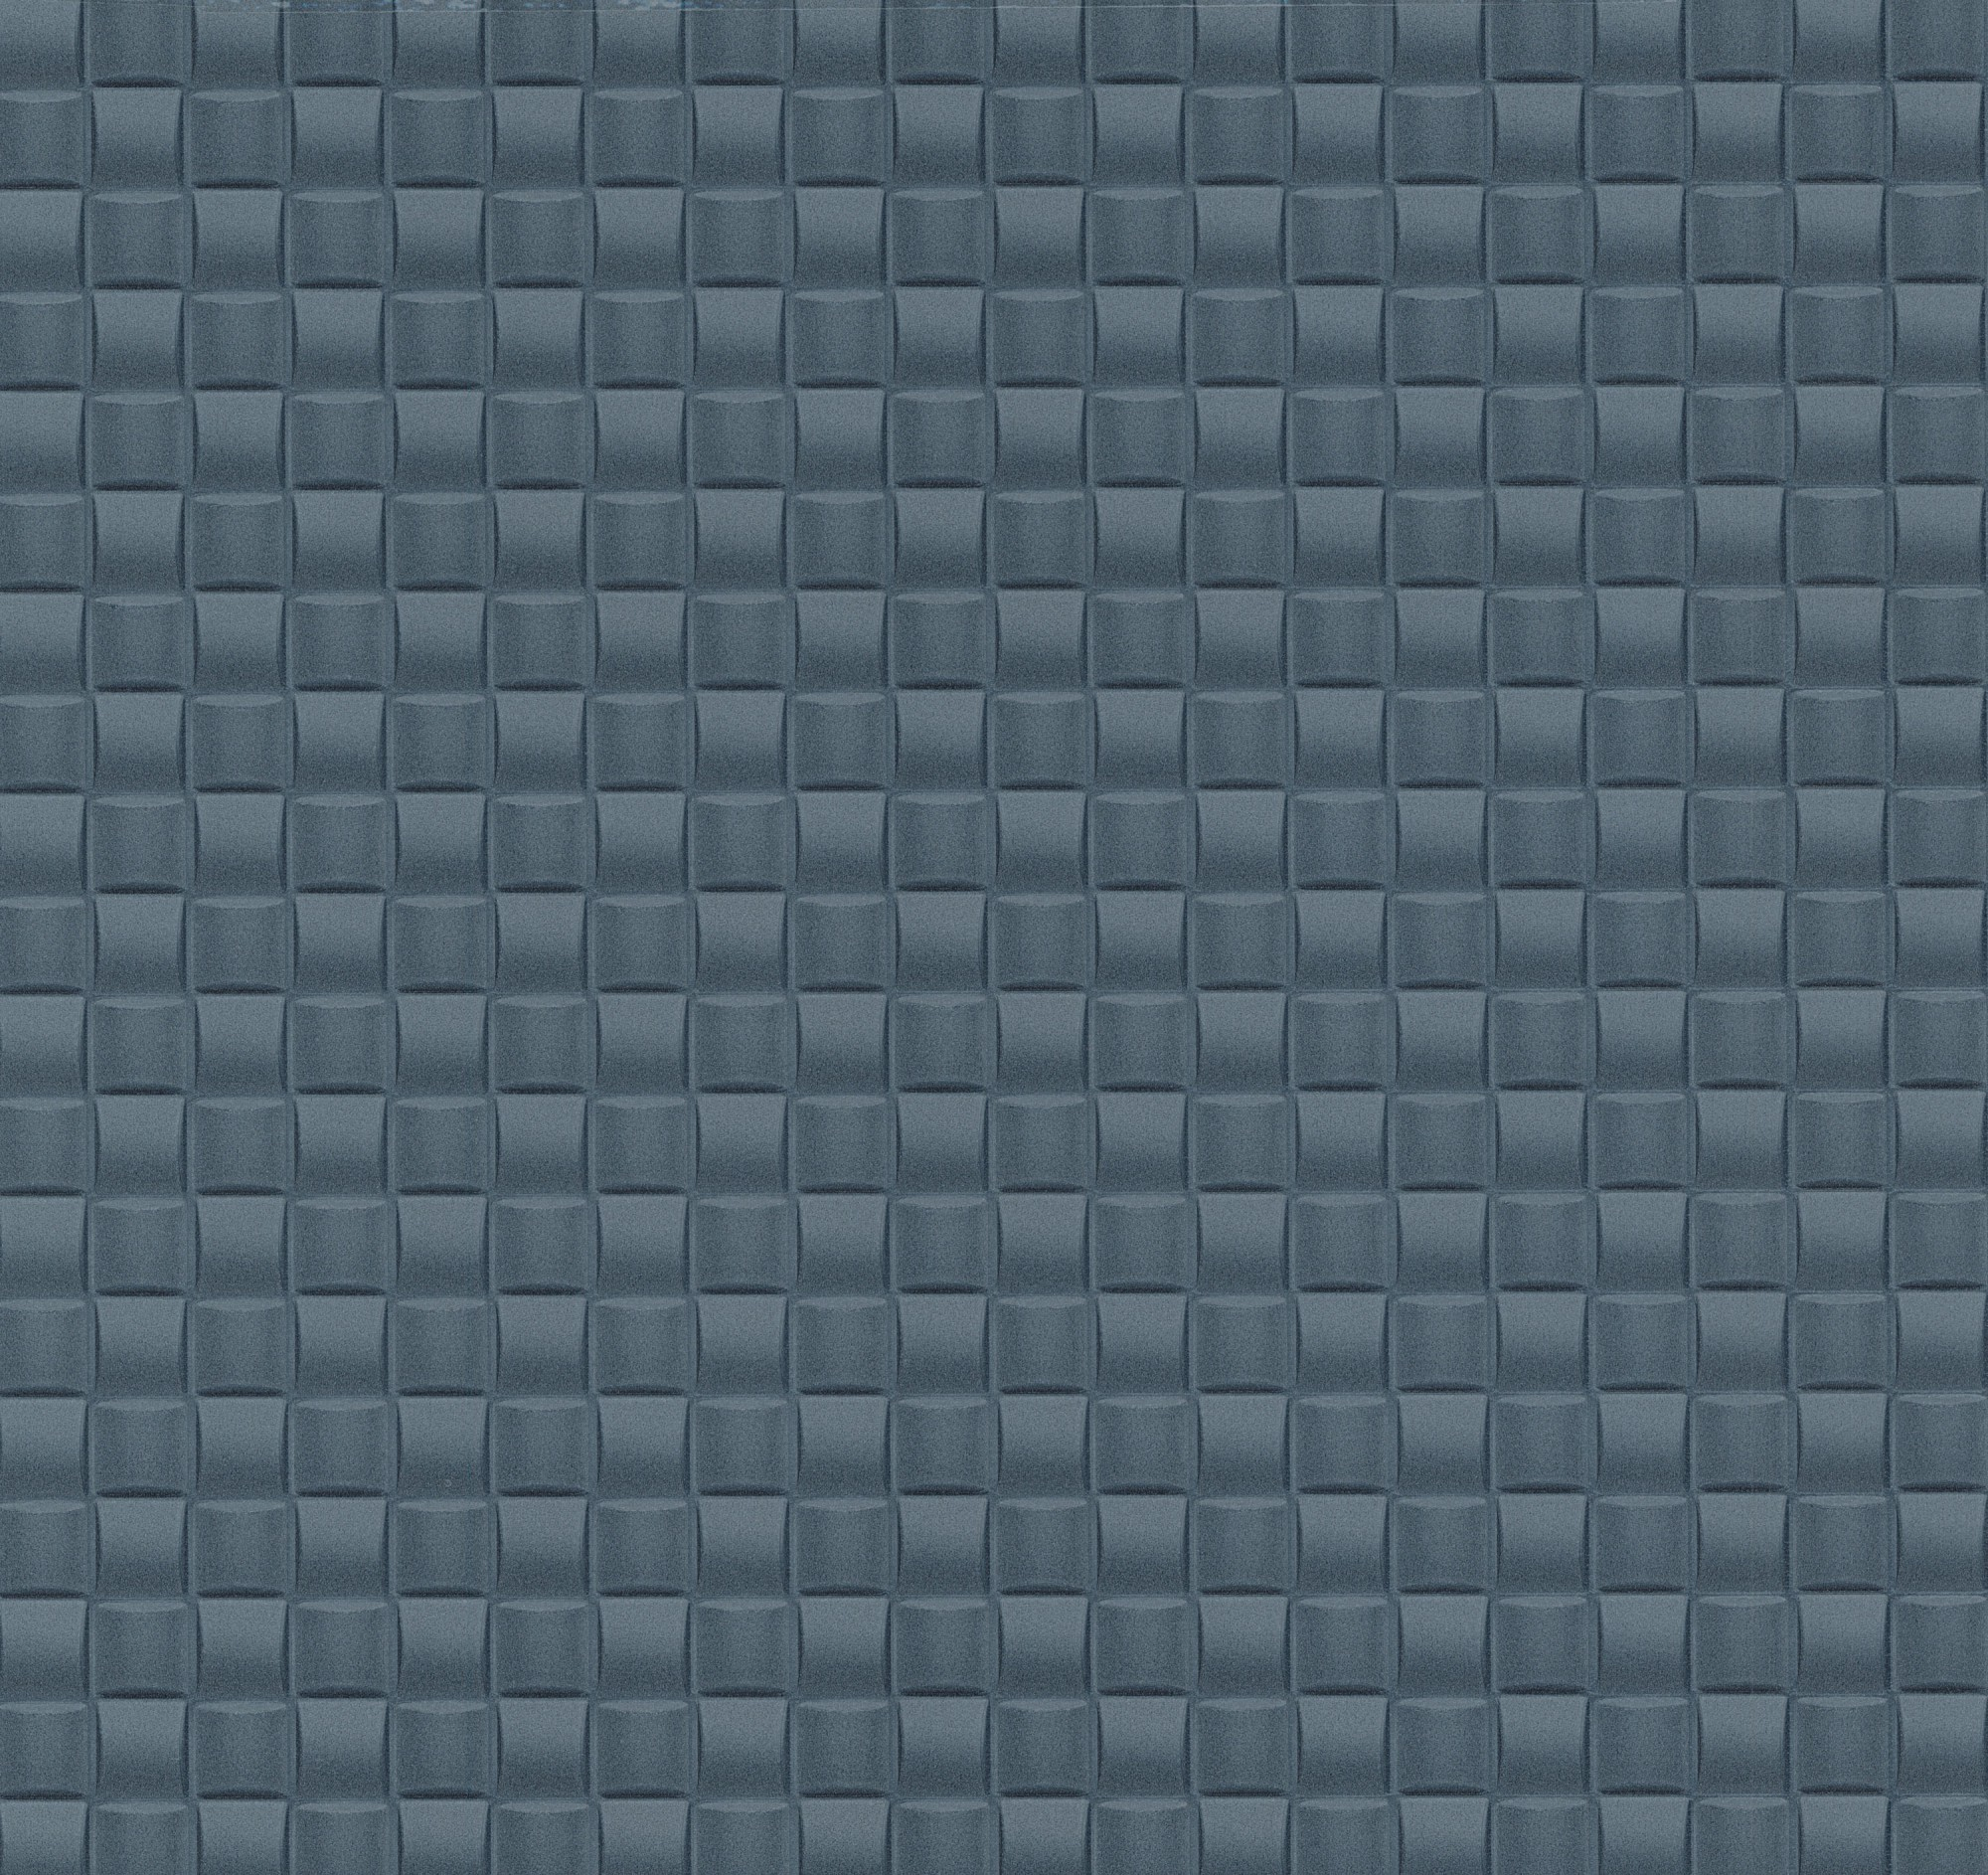 guido maria kretschmer tapete blau kachel 02468 50. Black Bedroom Furniture Sets. Home Design Ideas